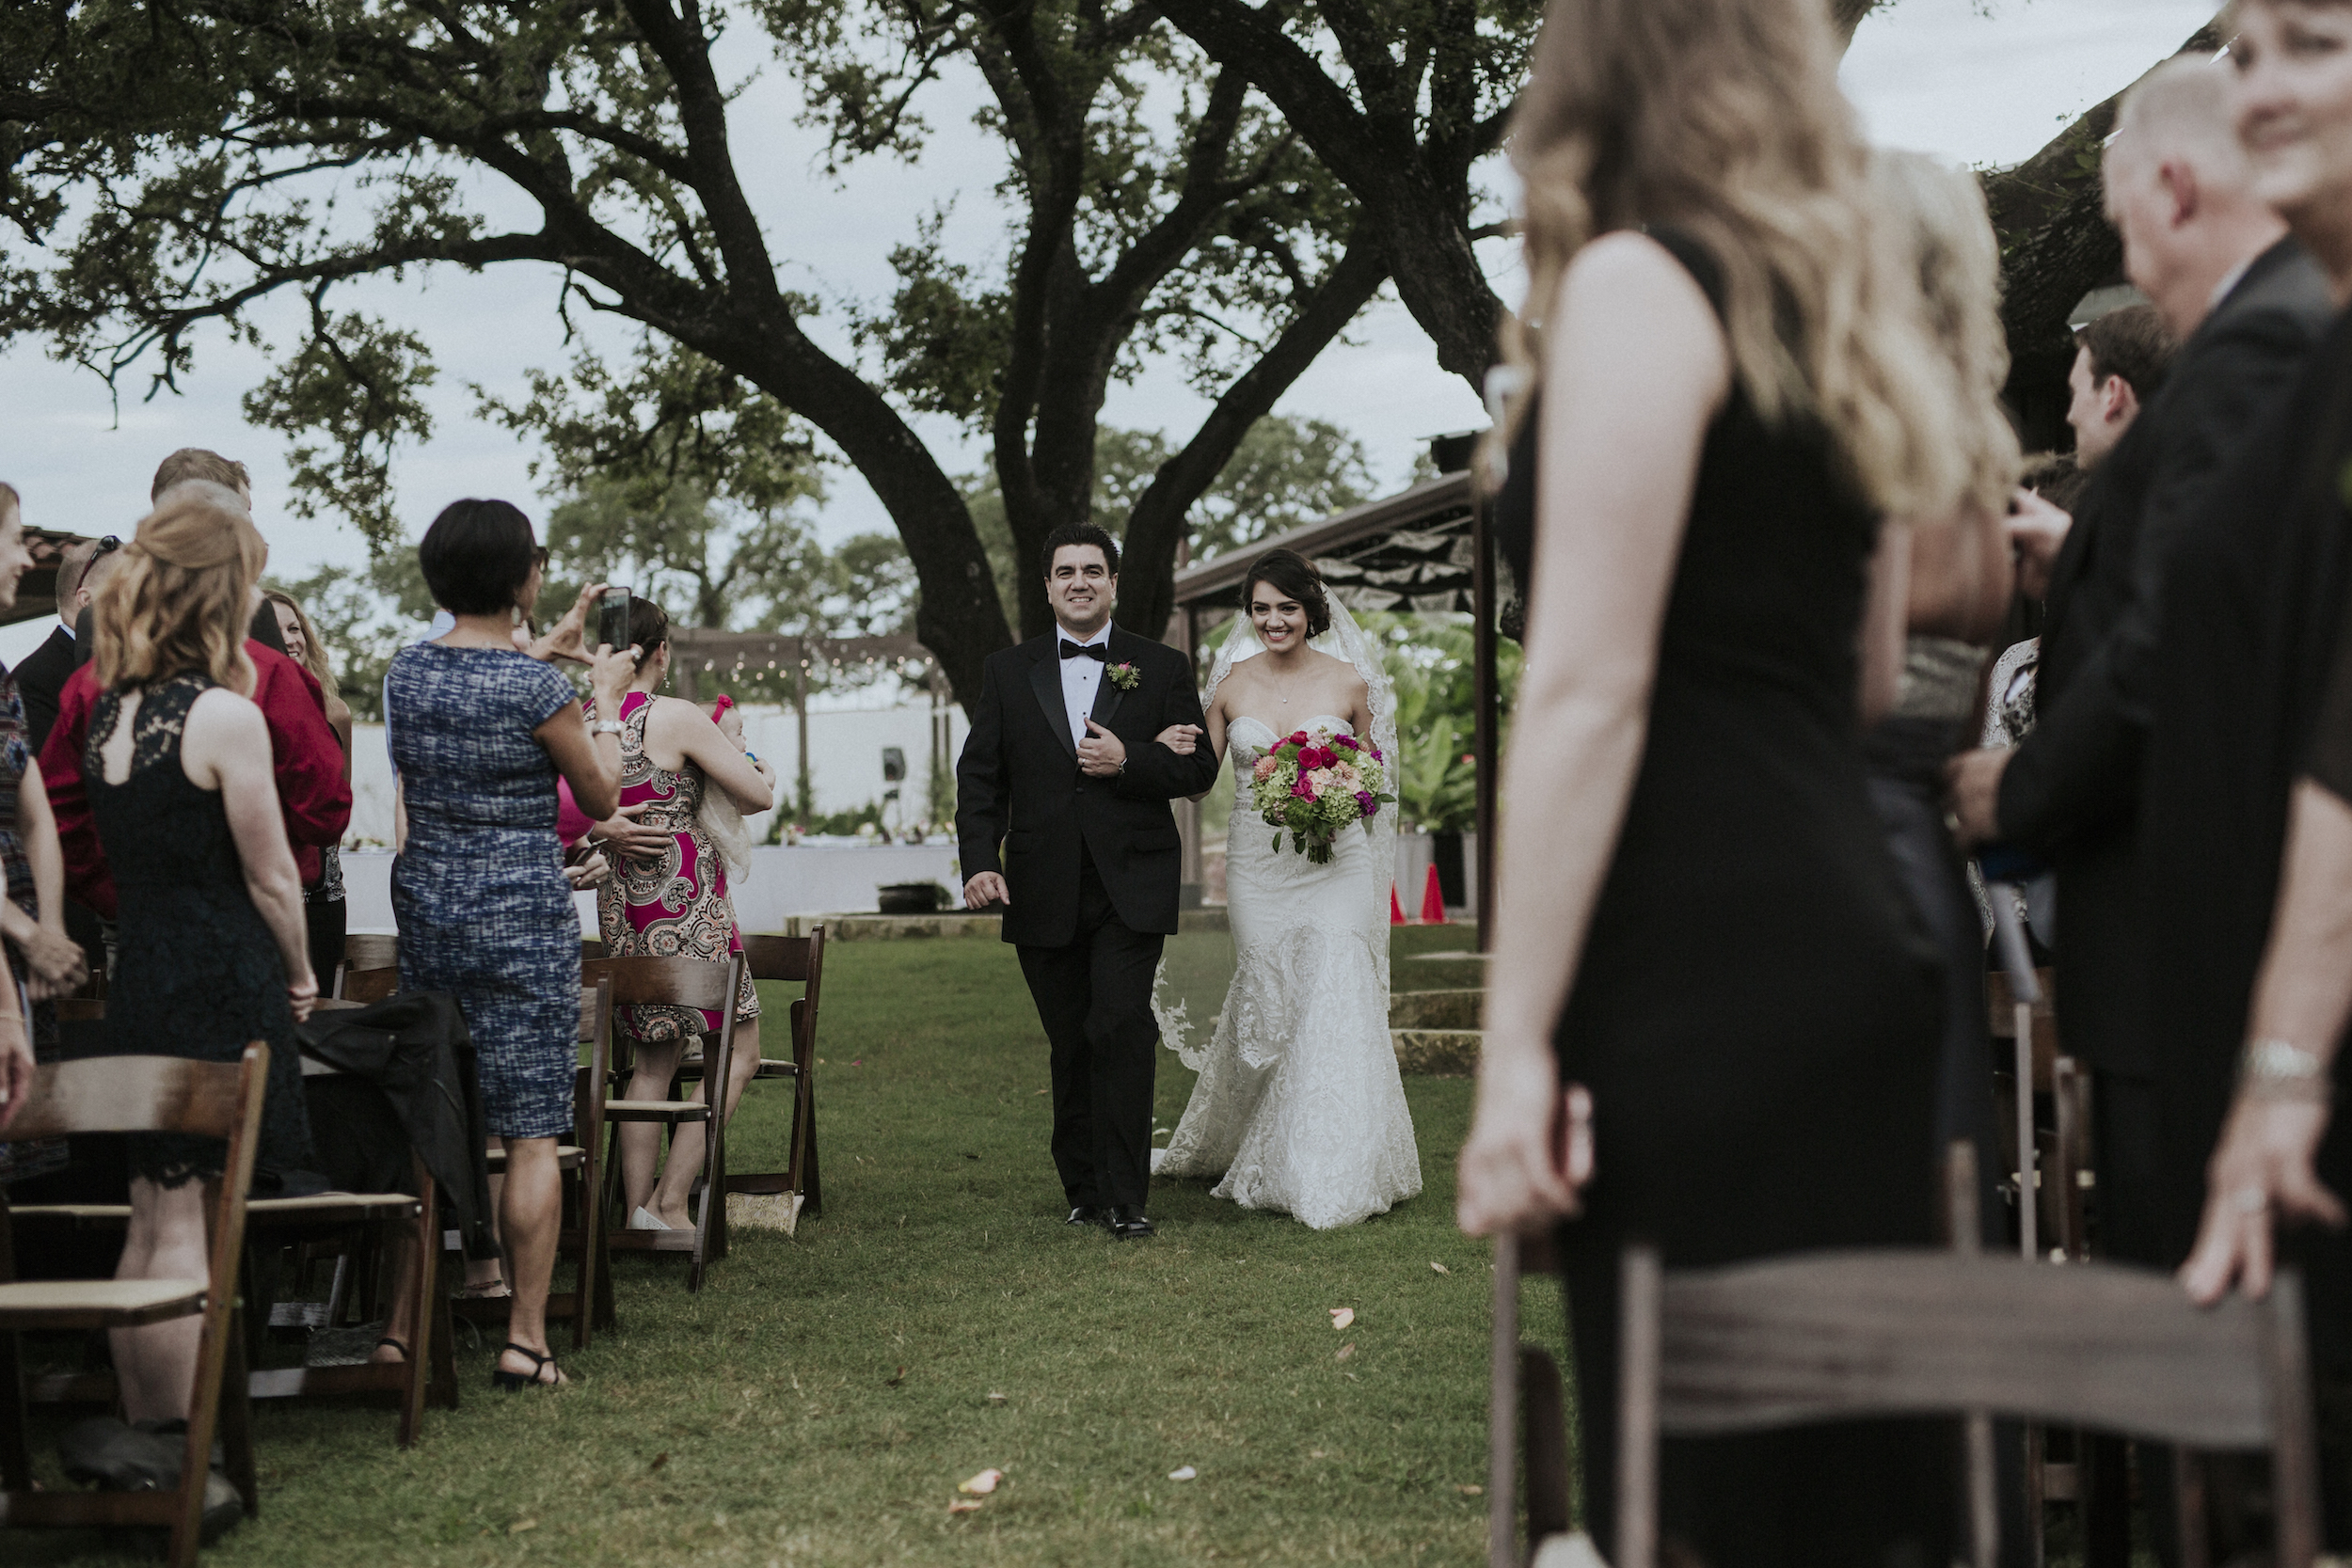 Garden Grove Wedding & Event Center5701.JPG